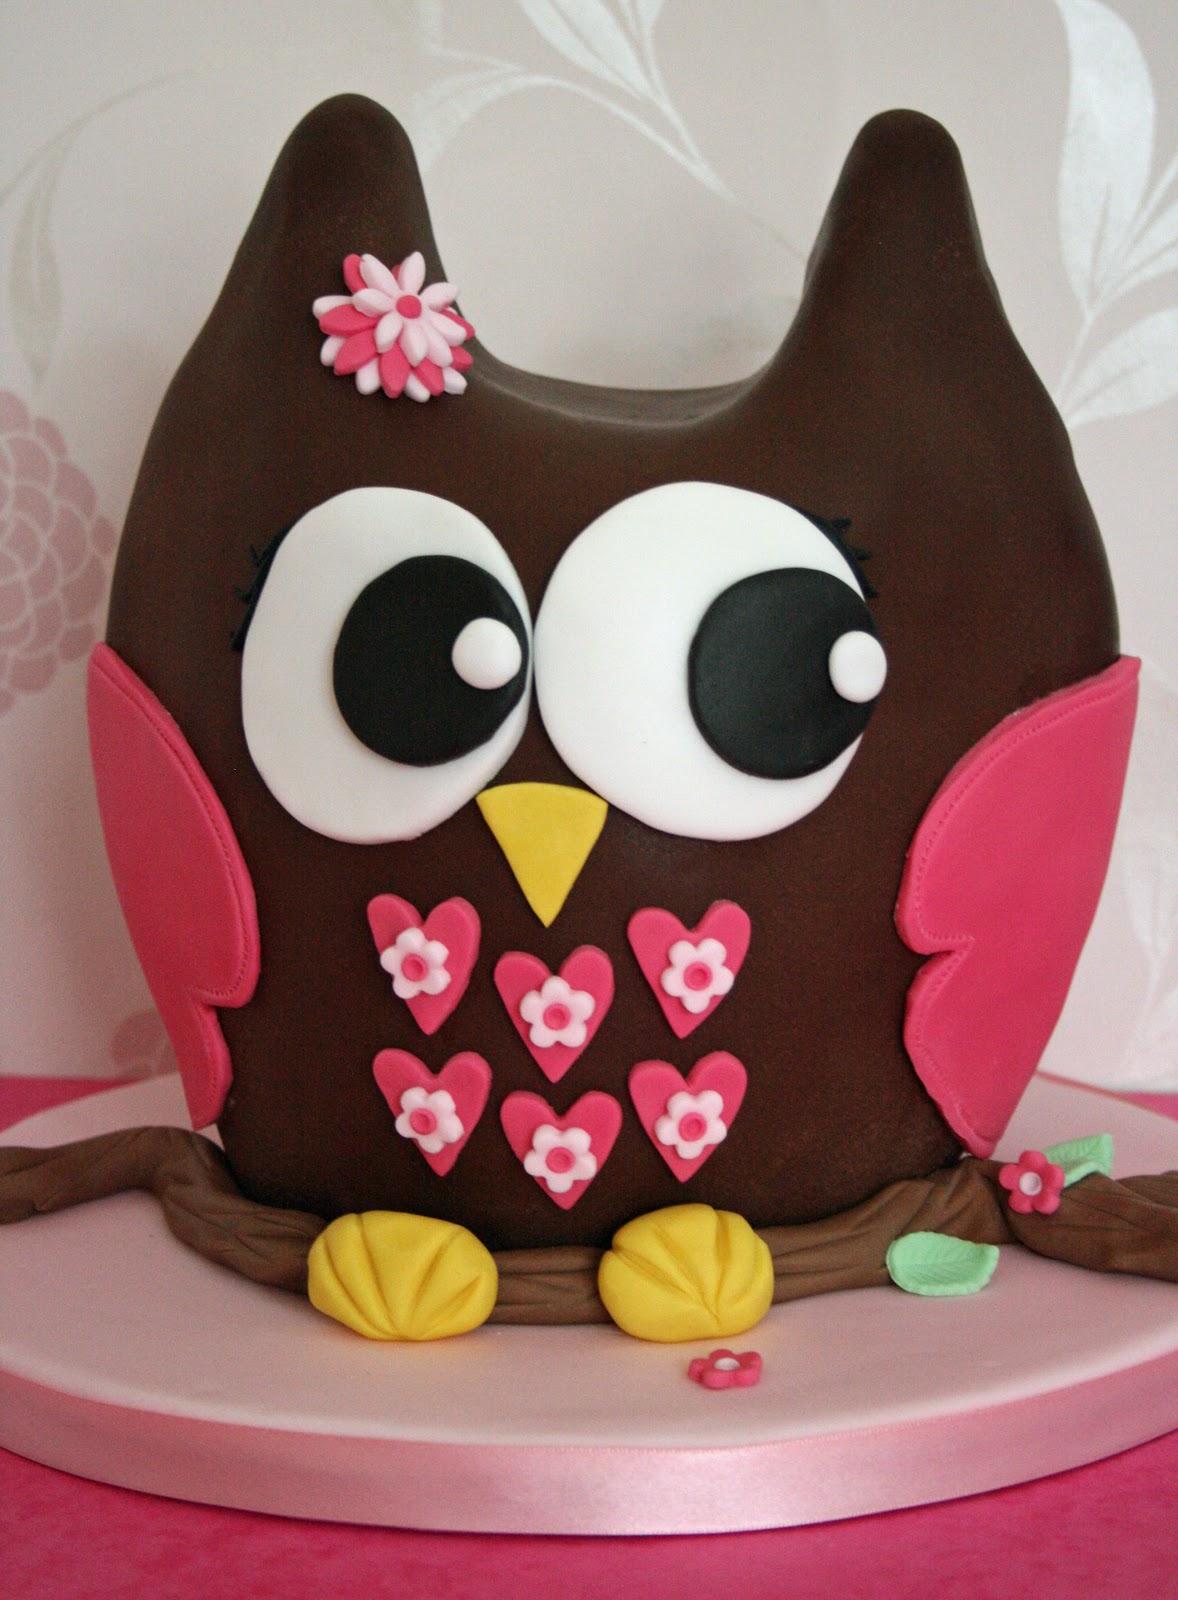 Lauralovescakes 3d Chocolate Owl Cake